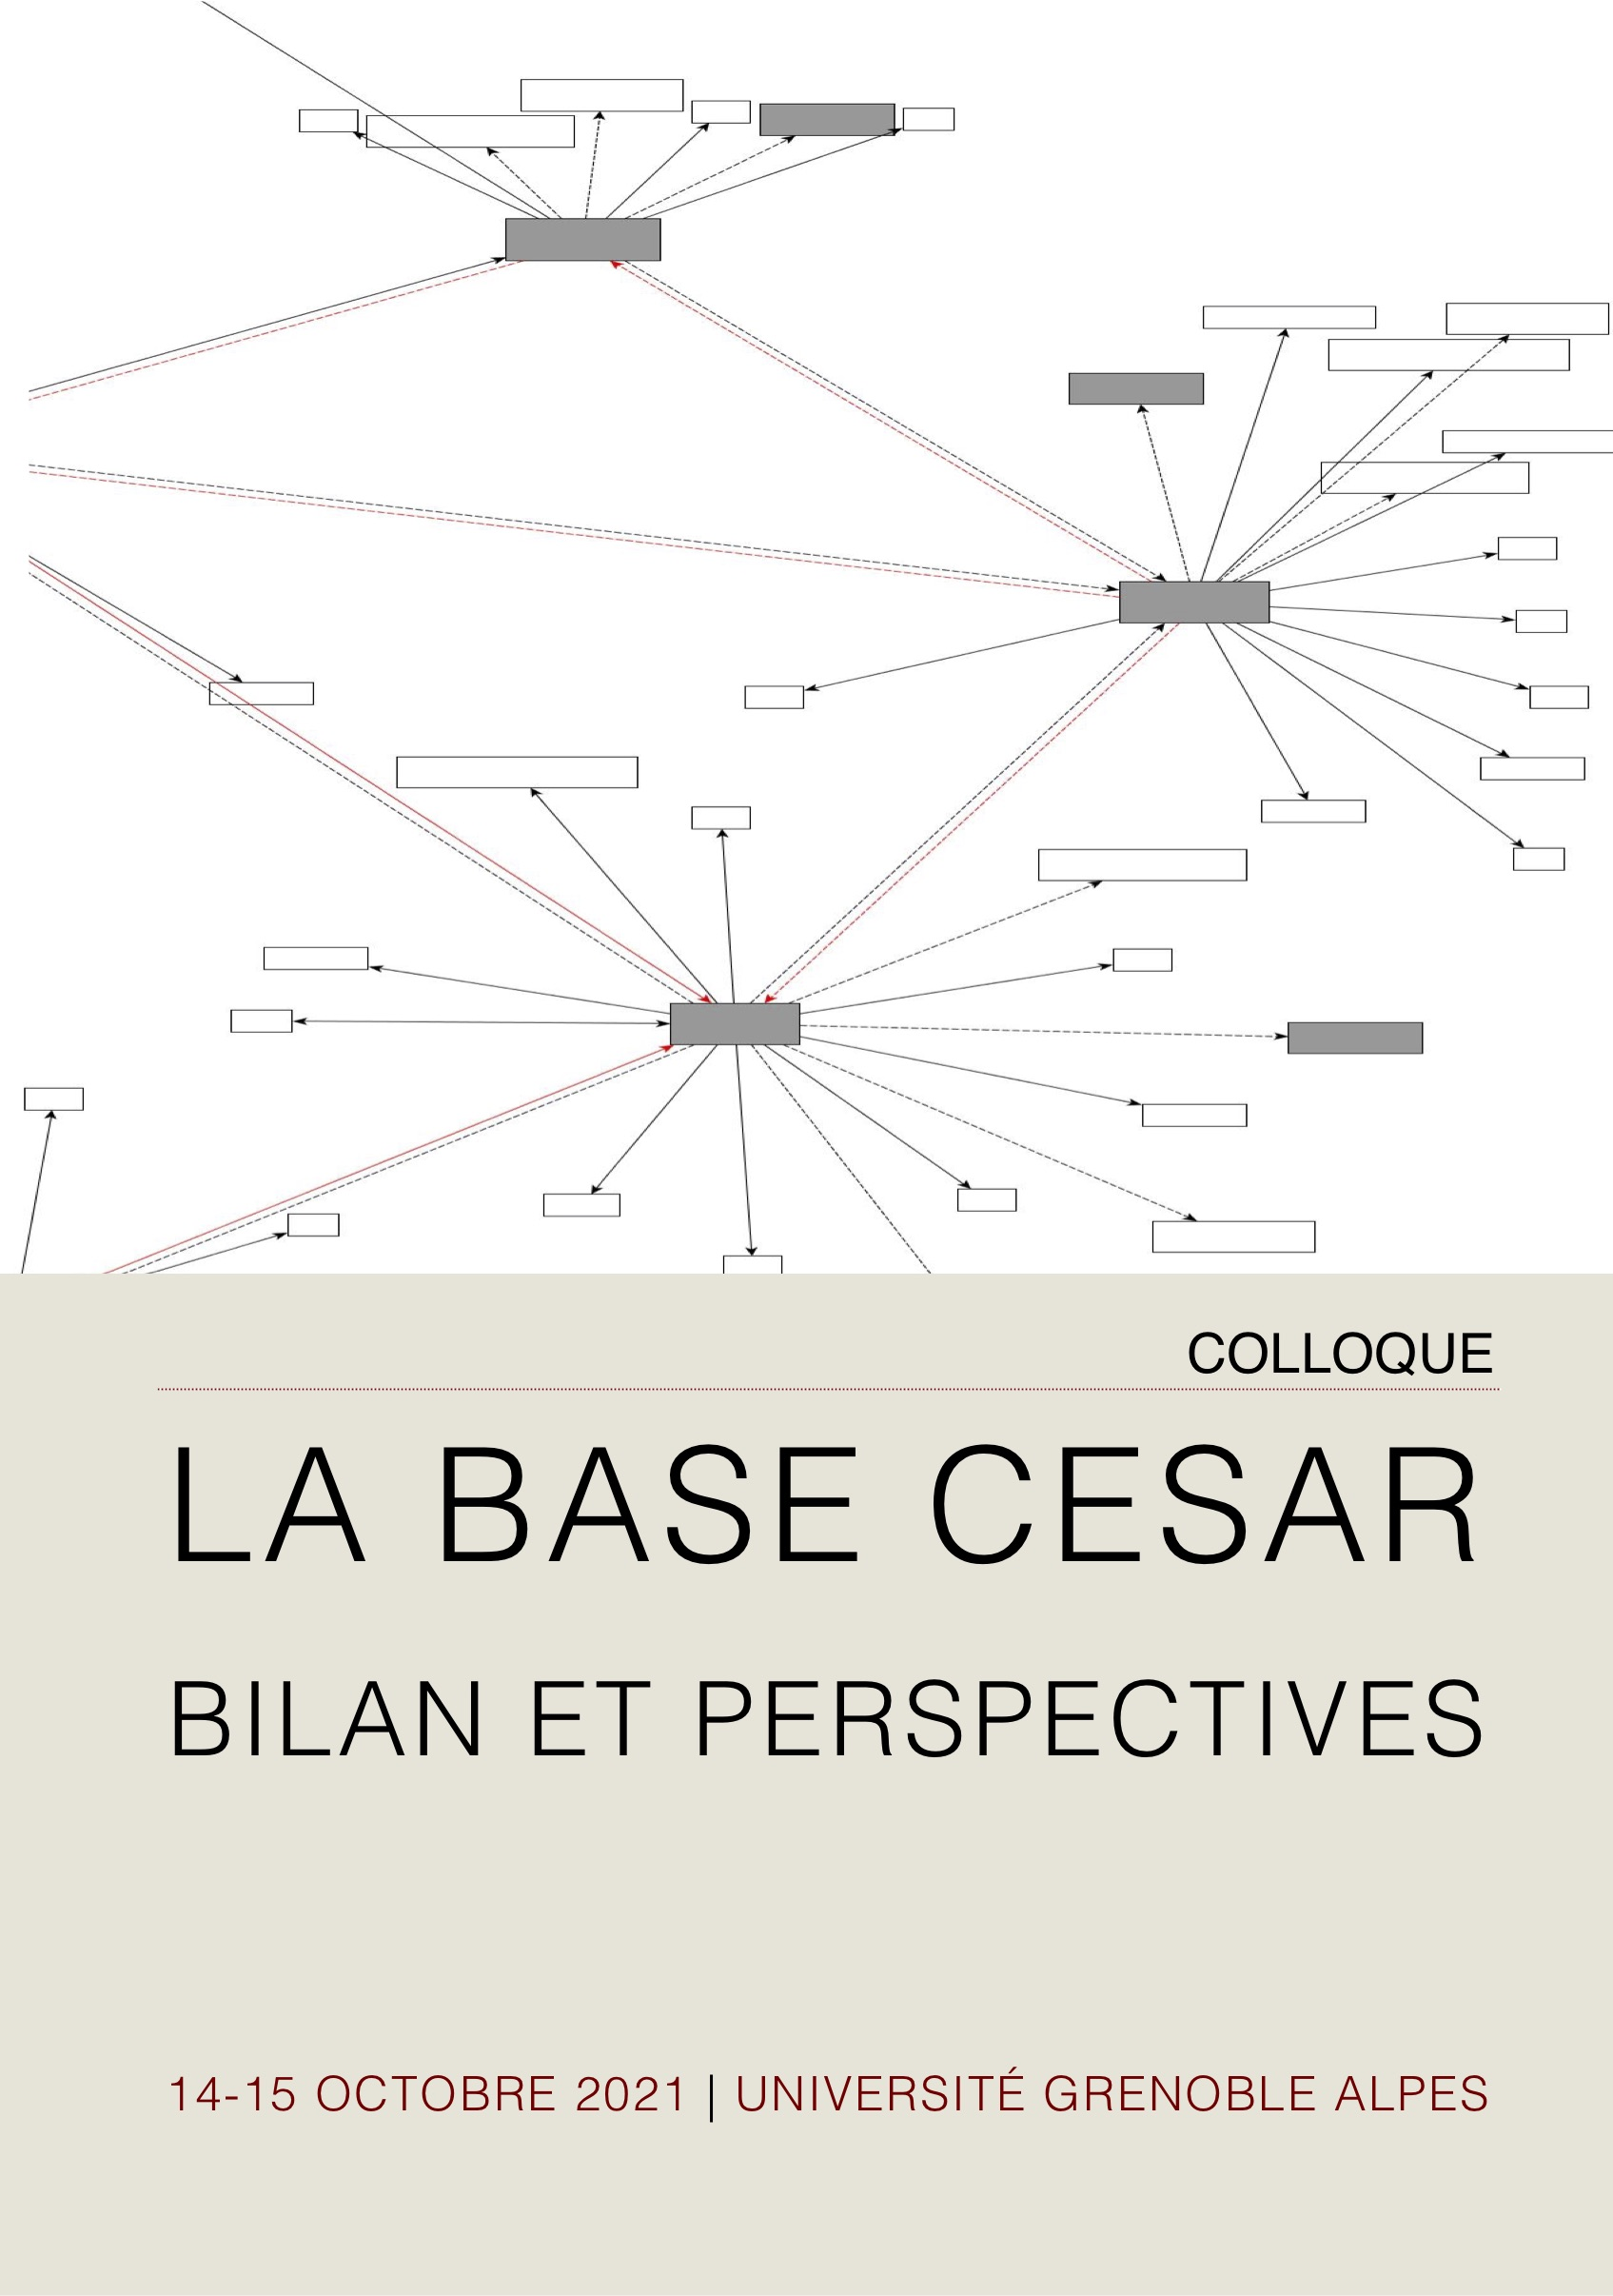 La base CESAR : bilan et perspectives (Grenoble)